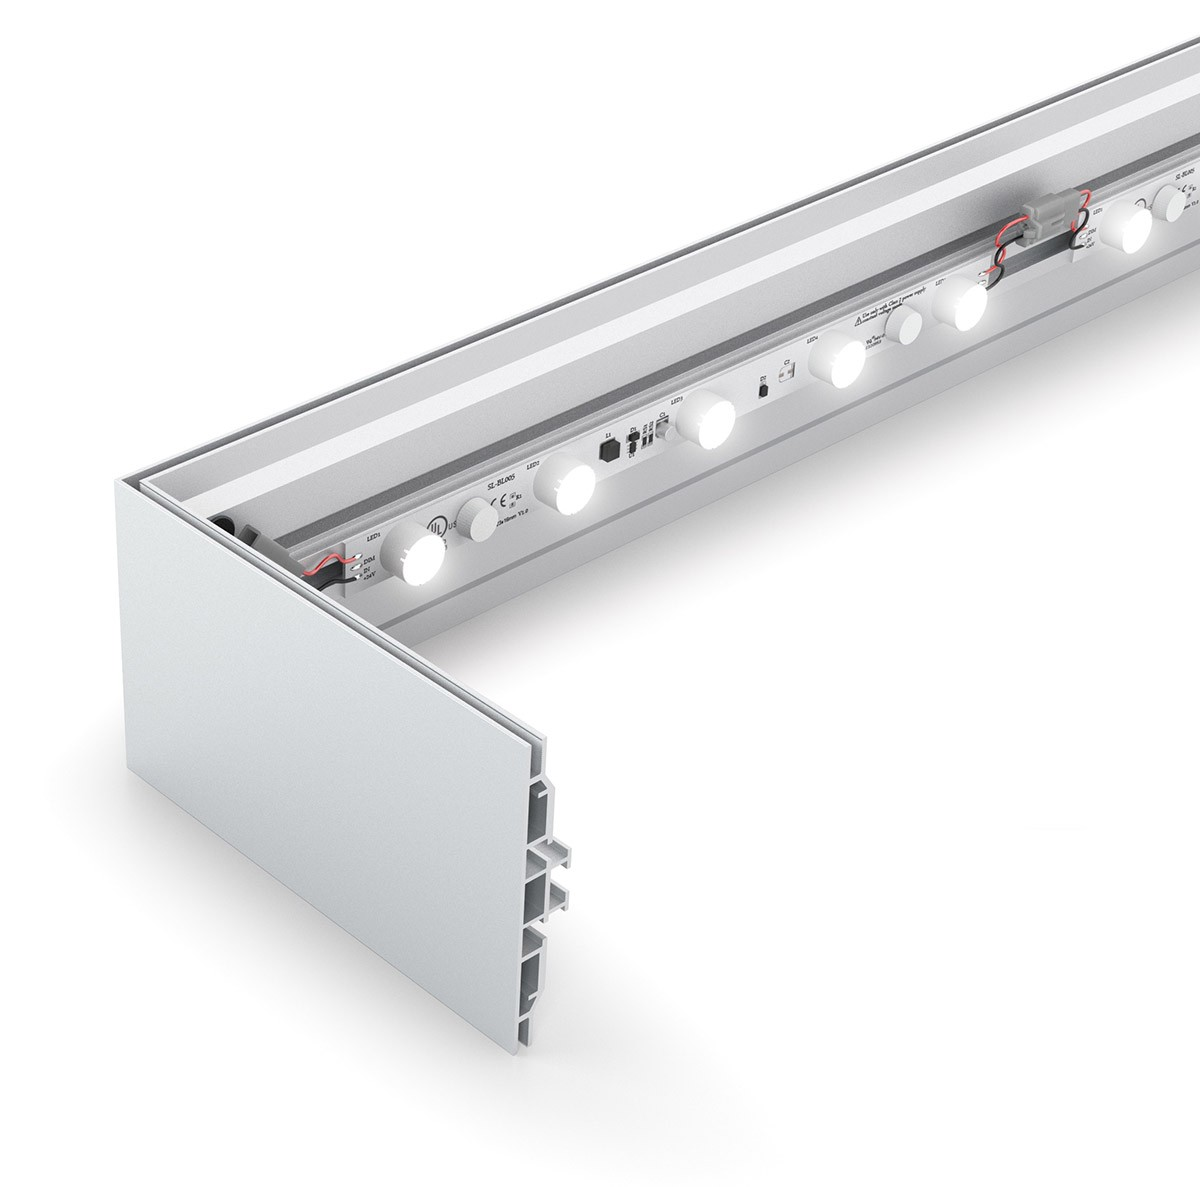 Charisma 96x120 Double Sided LED SEG Fabric Light Box